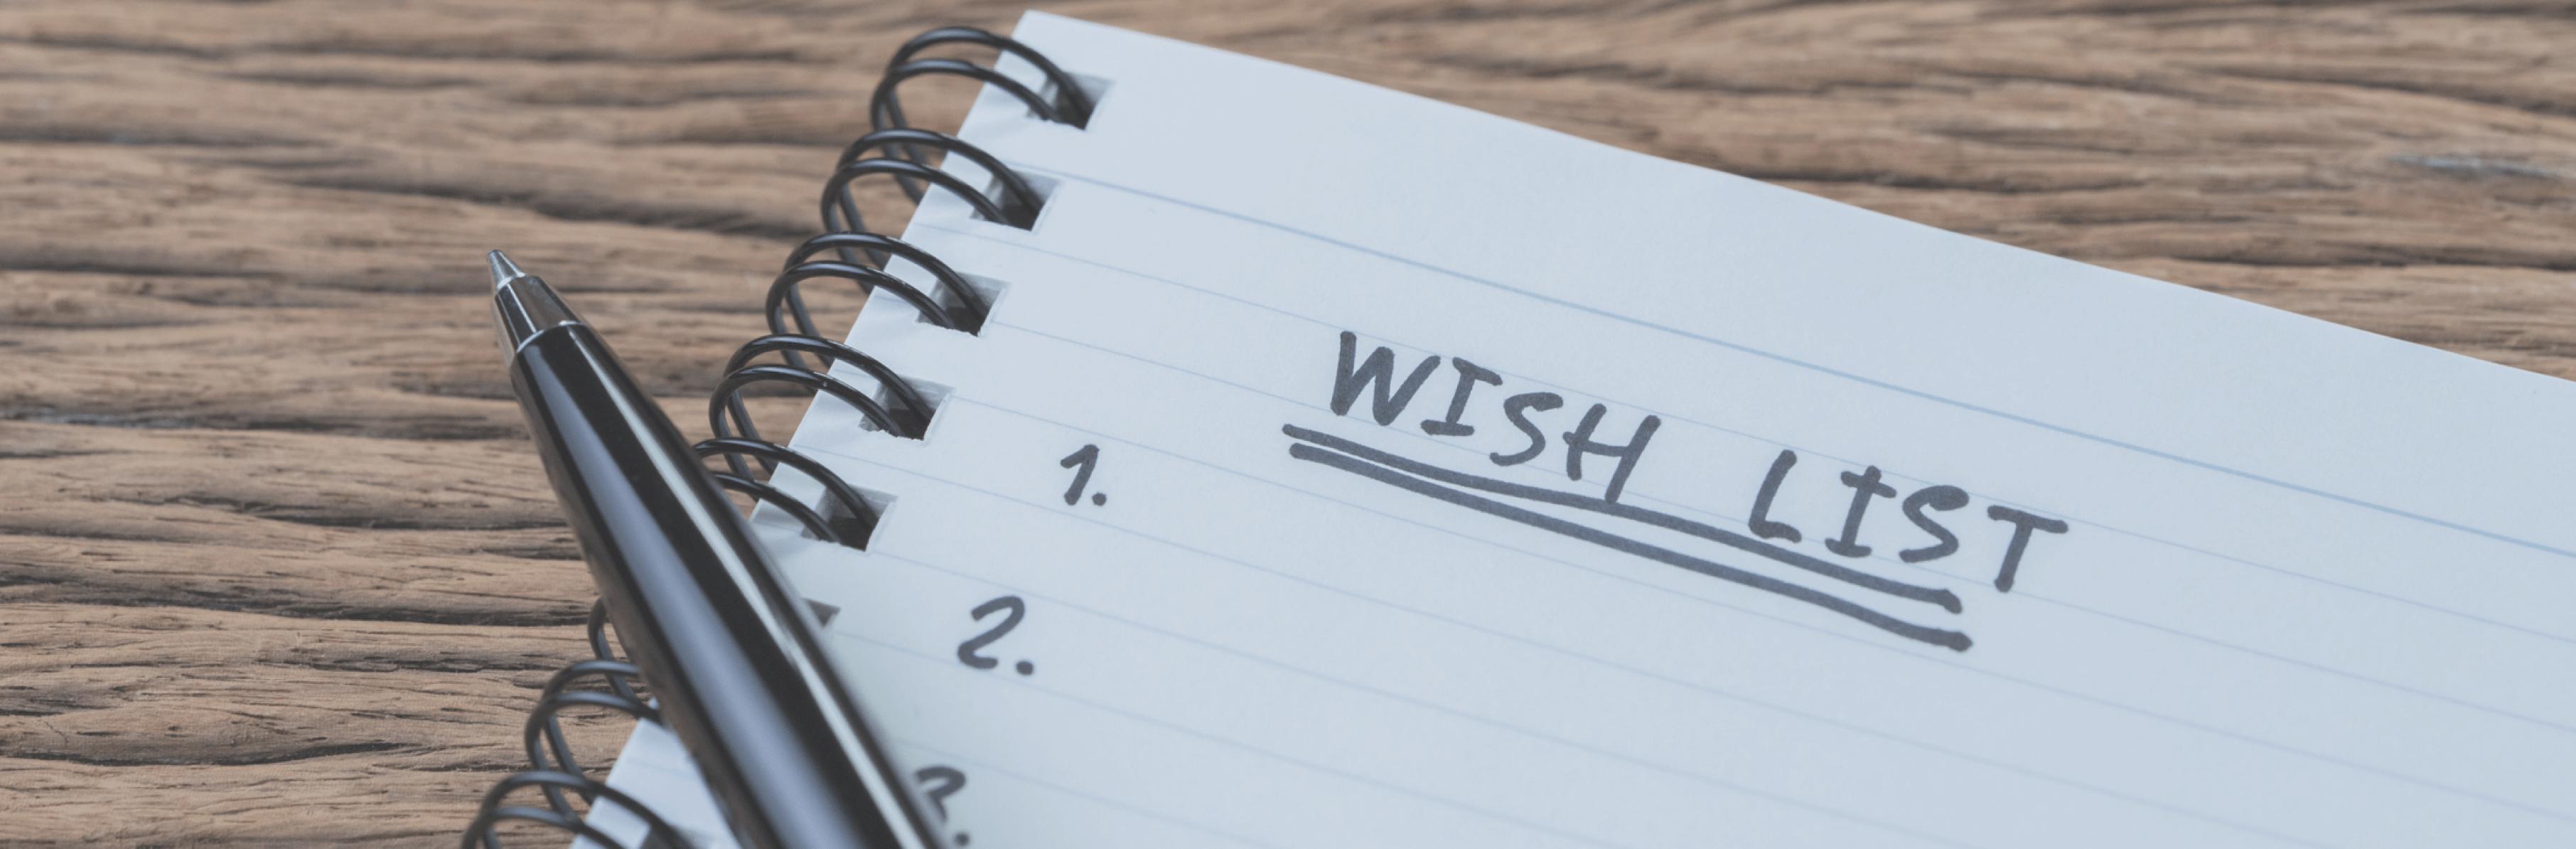 retirement-wishlist